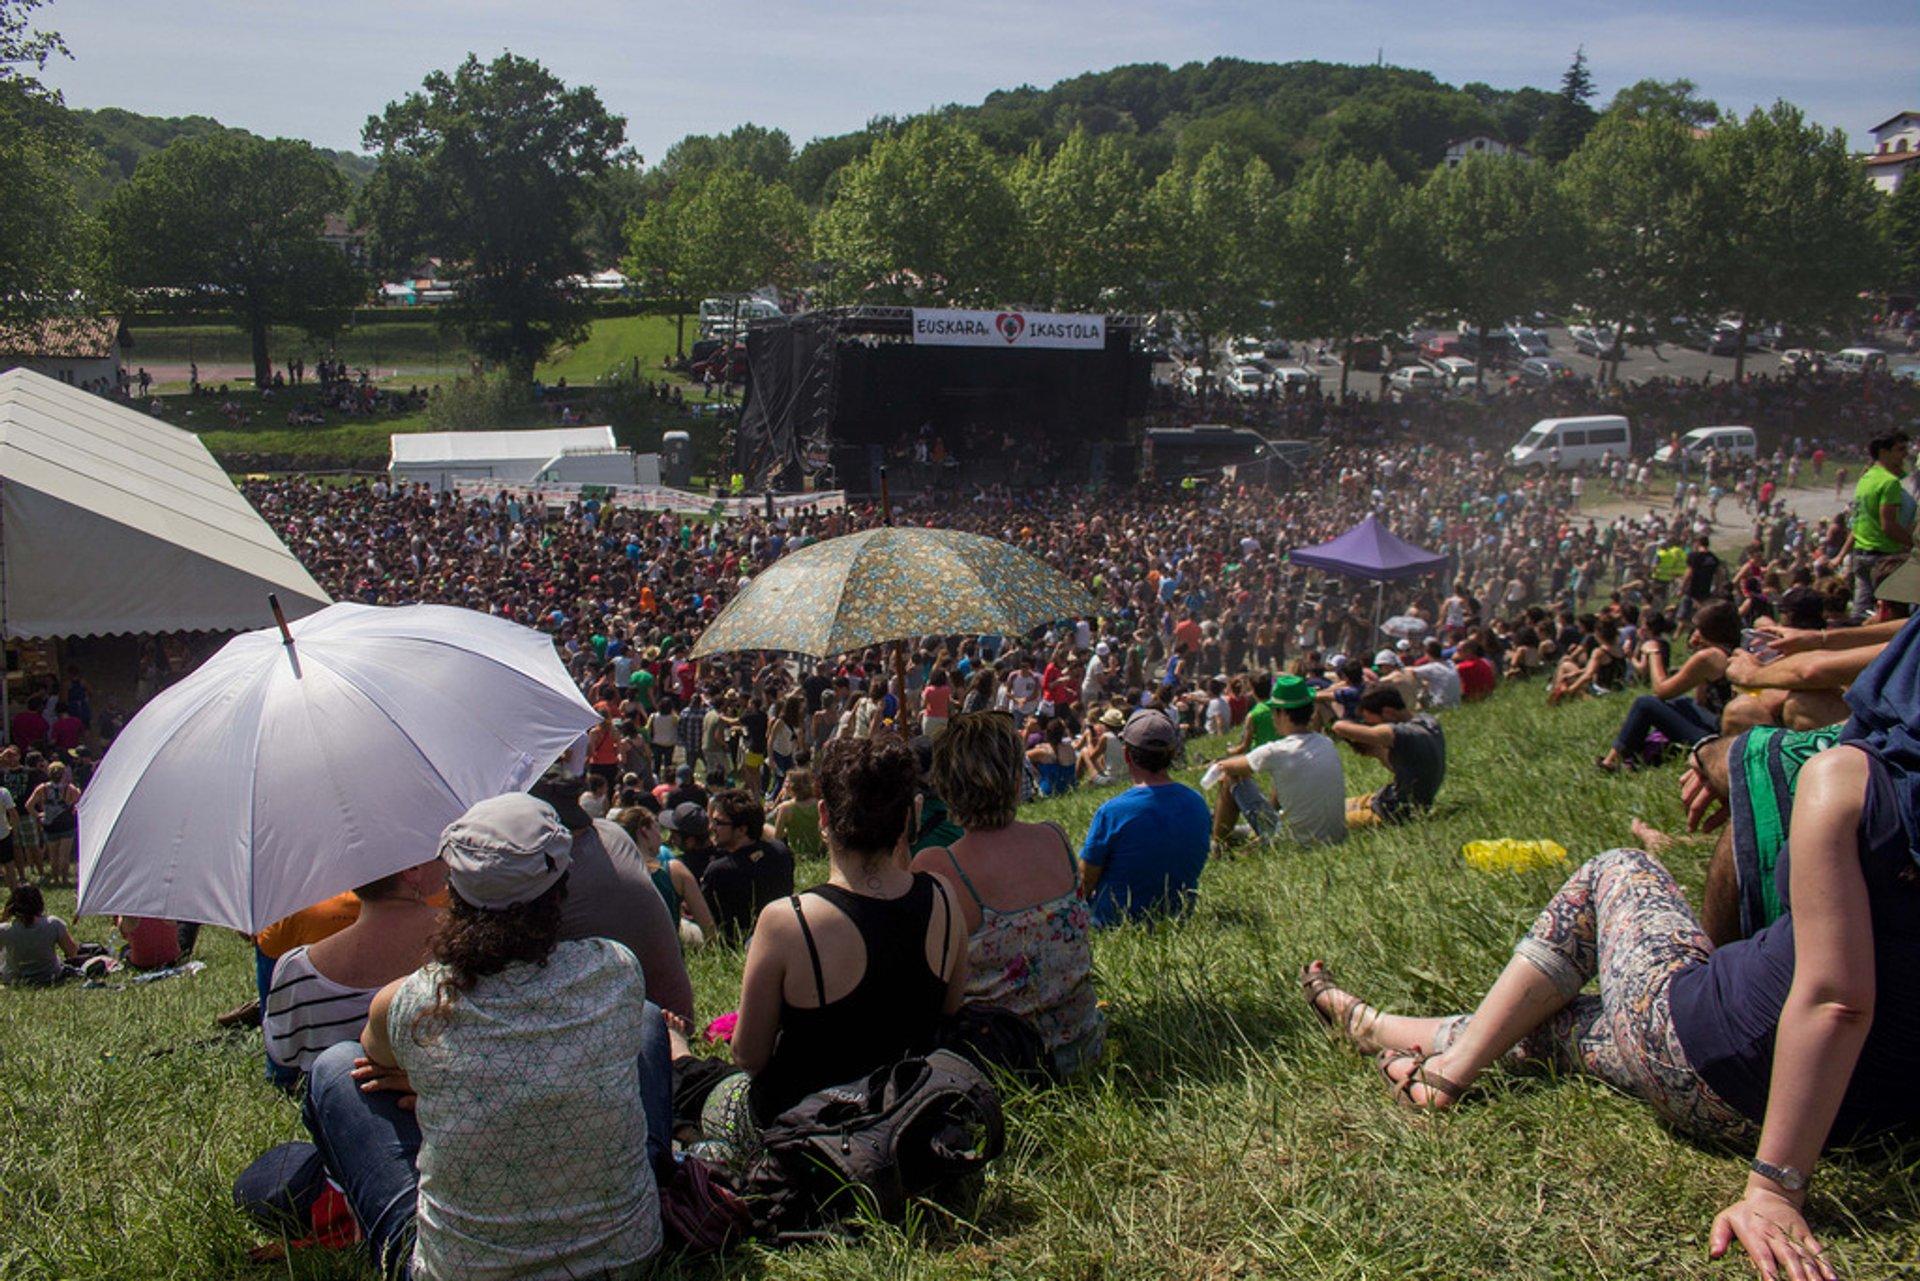 Herri Urrats Festival in France 2020 - Best Time